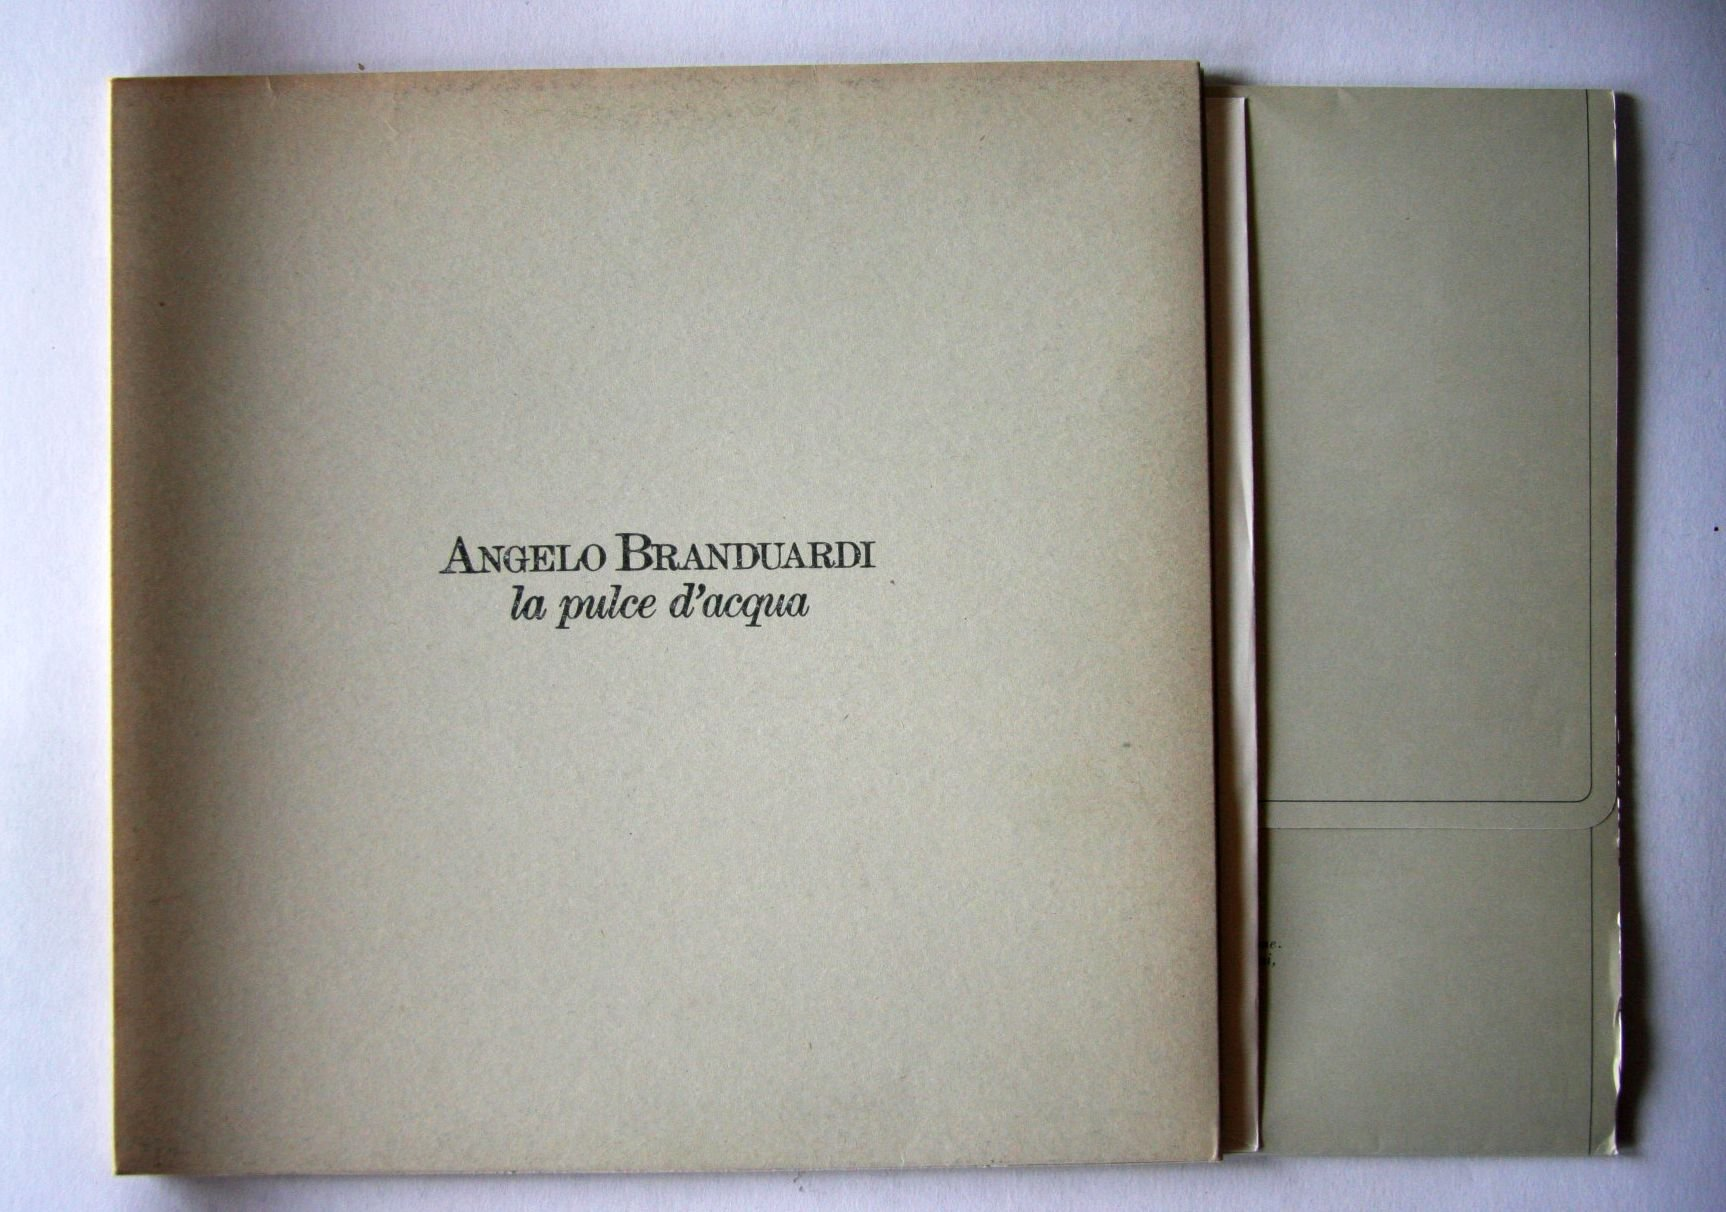 Angelo Branduardi - La Pulce D'acqua Vinyl